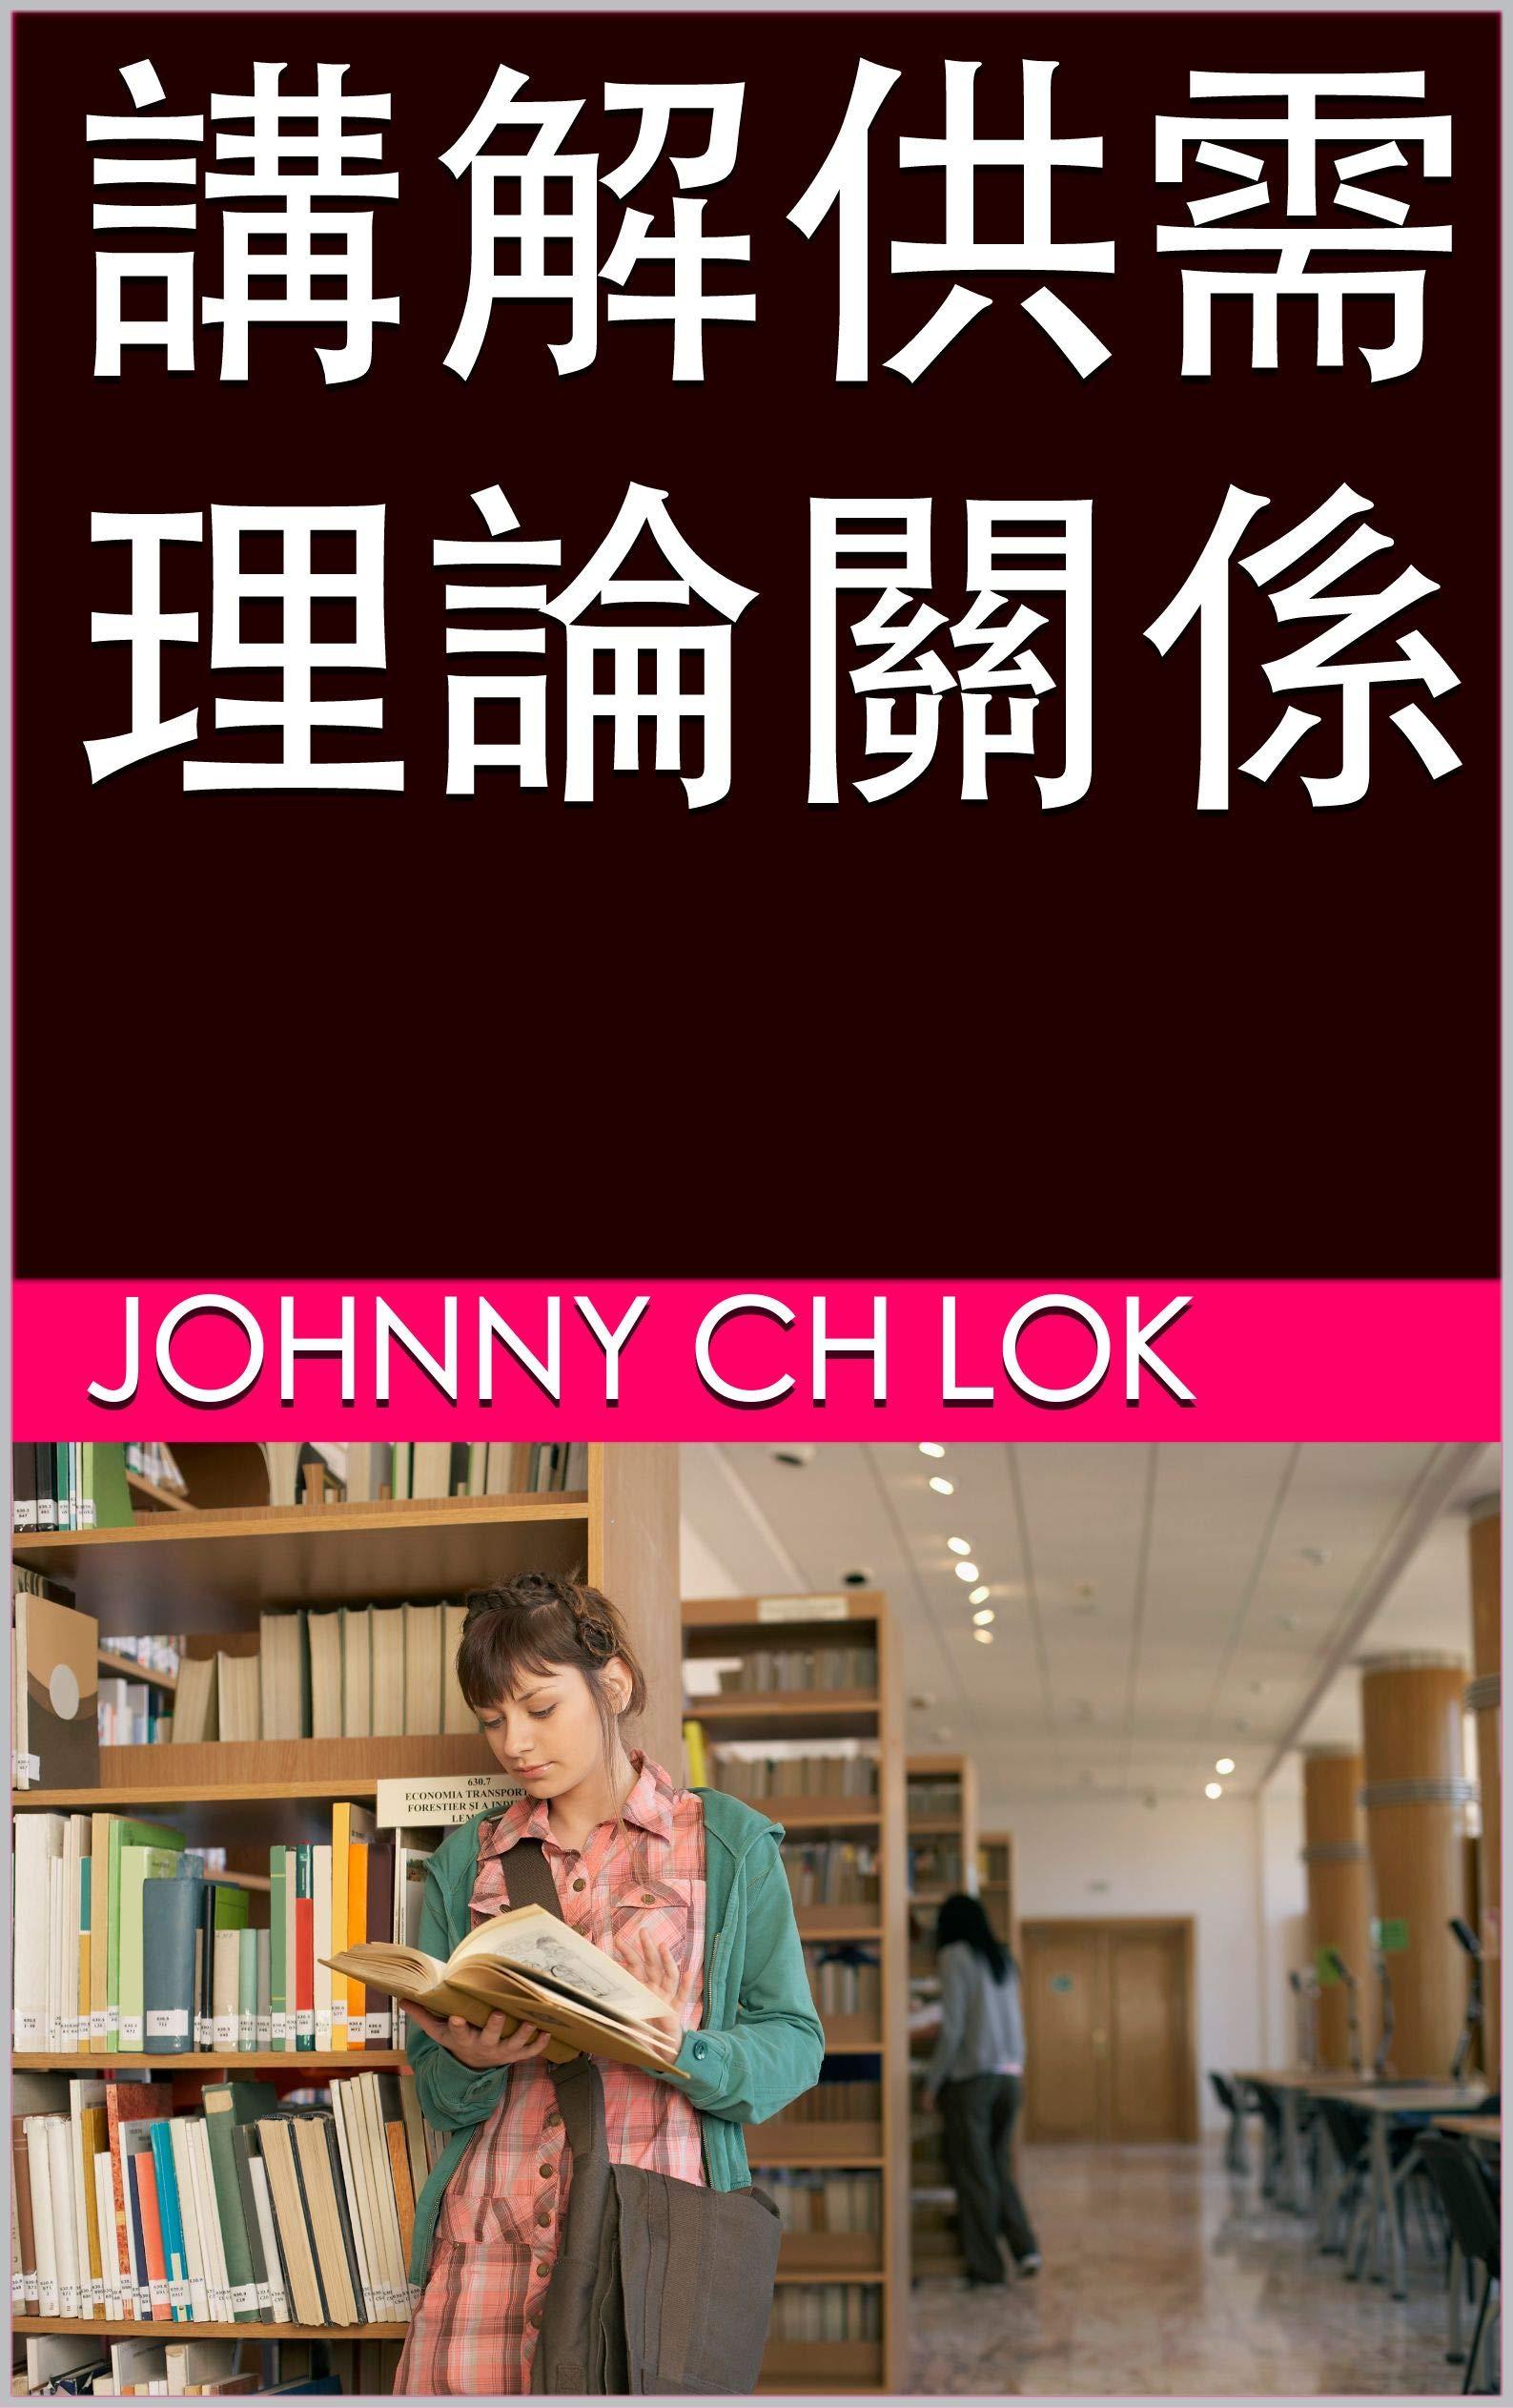 講解供需理論關係 (經濟學理論) (Traditional Chinese Edition)